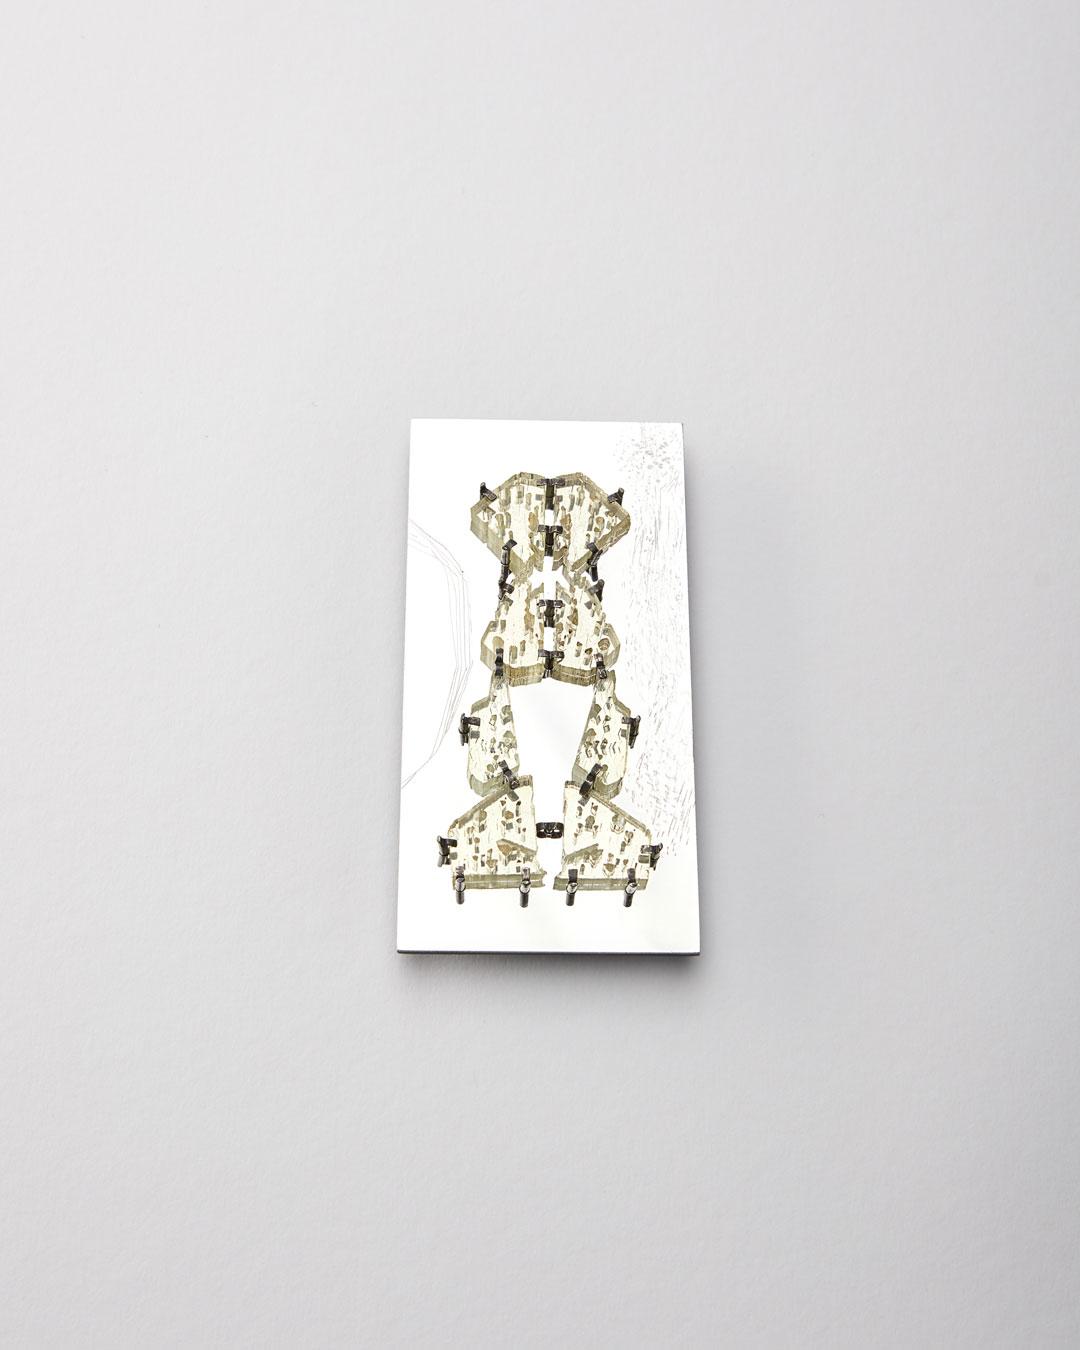 Iris Bodemer, Figur 1 (Figure 1), 2019, brooch; beryl, Alu-Dibond, silver, mounting adhesive, 150 x 70 x 15 mm, €4000